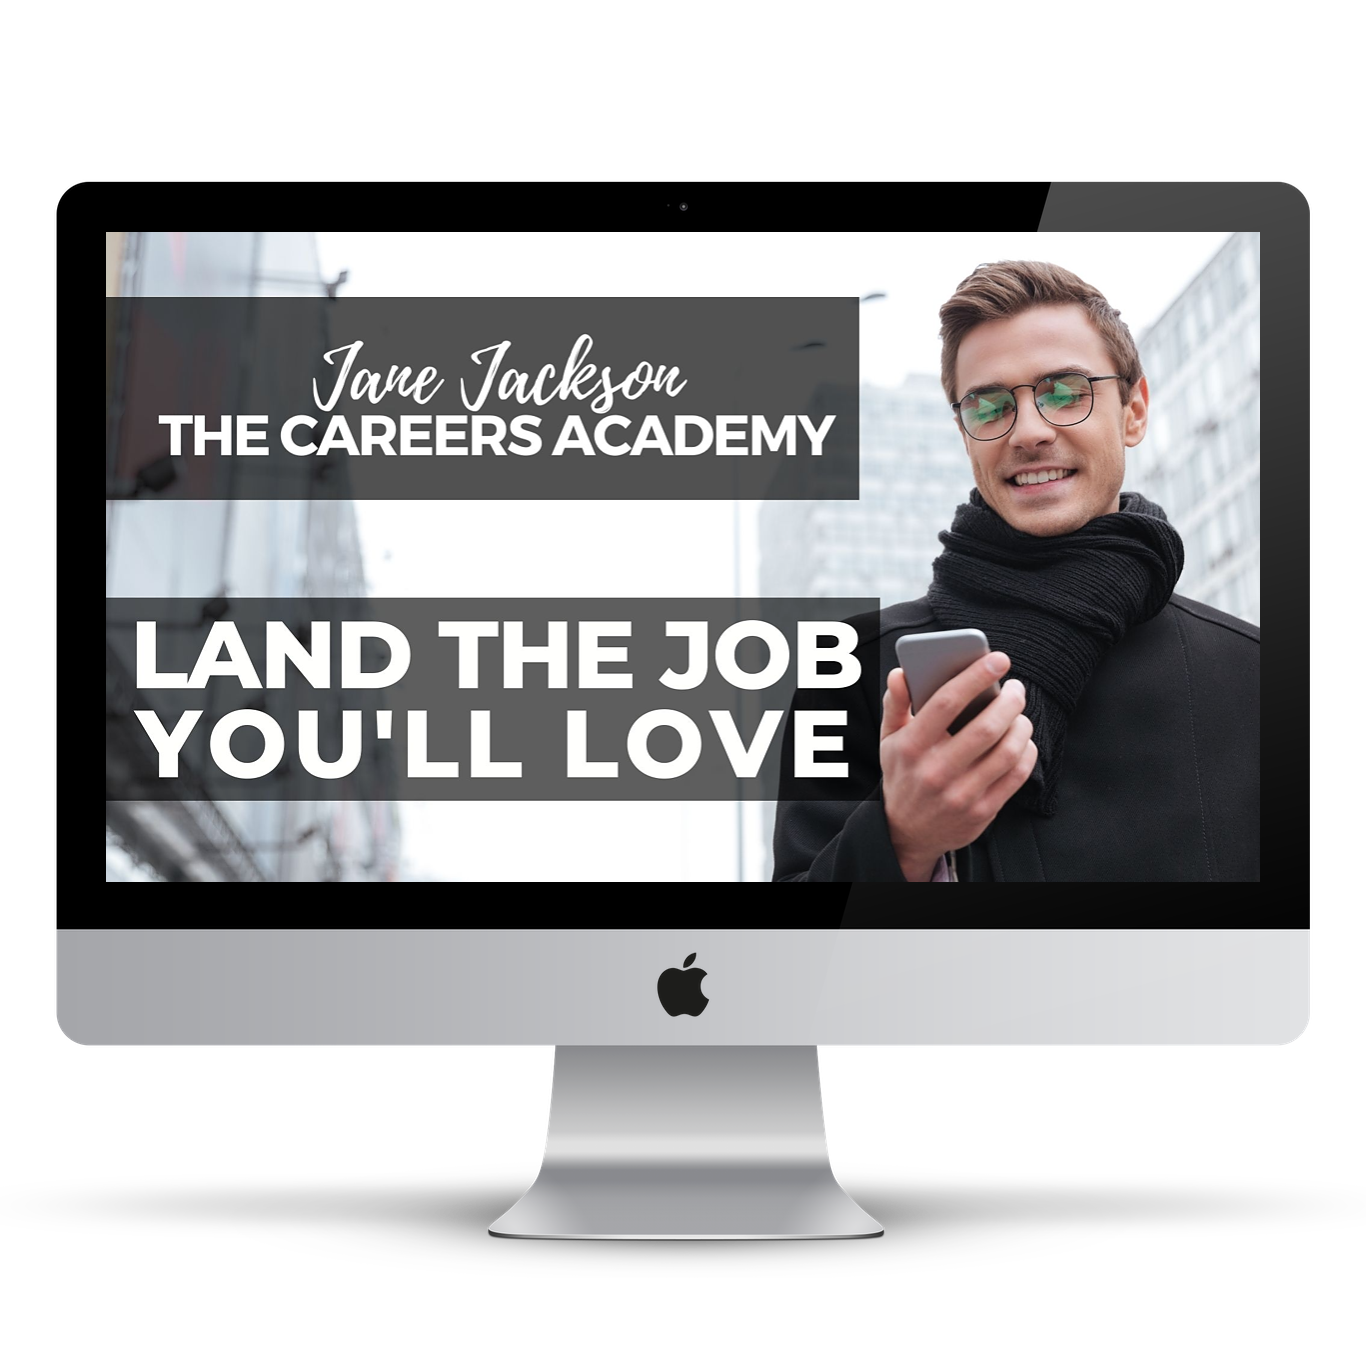 The Careers Academy, Jane Jackson, Career Coach, career coaching, career counsellor, sydney career coach, career coach australia, career change, job search coach, resume coach, linkedin training